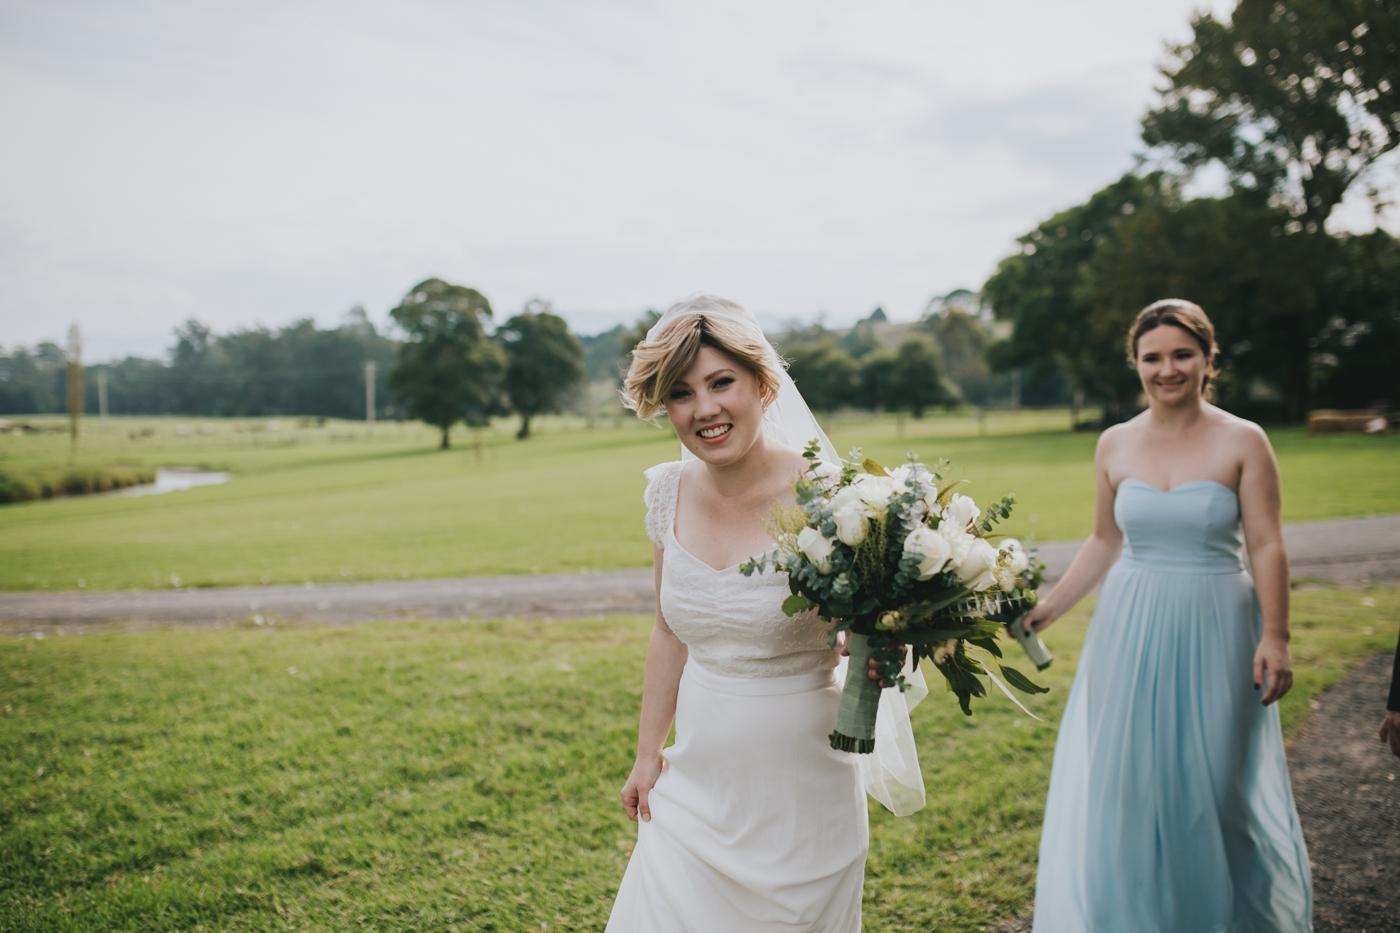 Rachel & Jacob - Willow Farm Berry - South Coast Wedding - Samantha Heather Photography-61.jpg